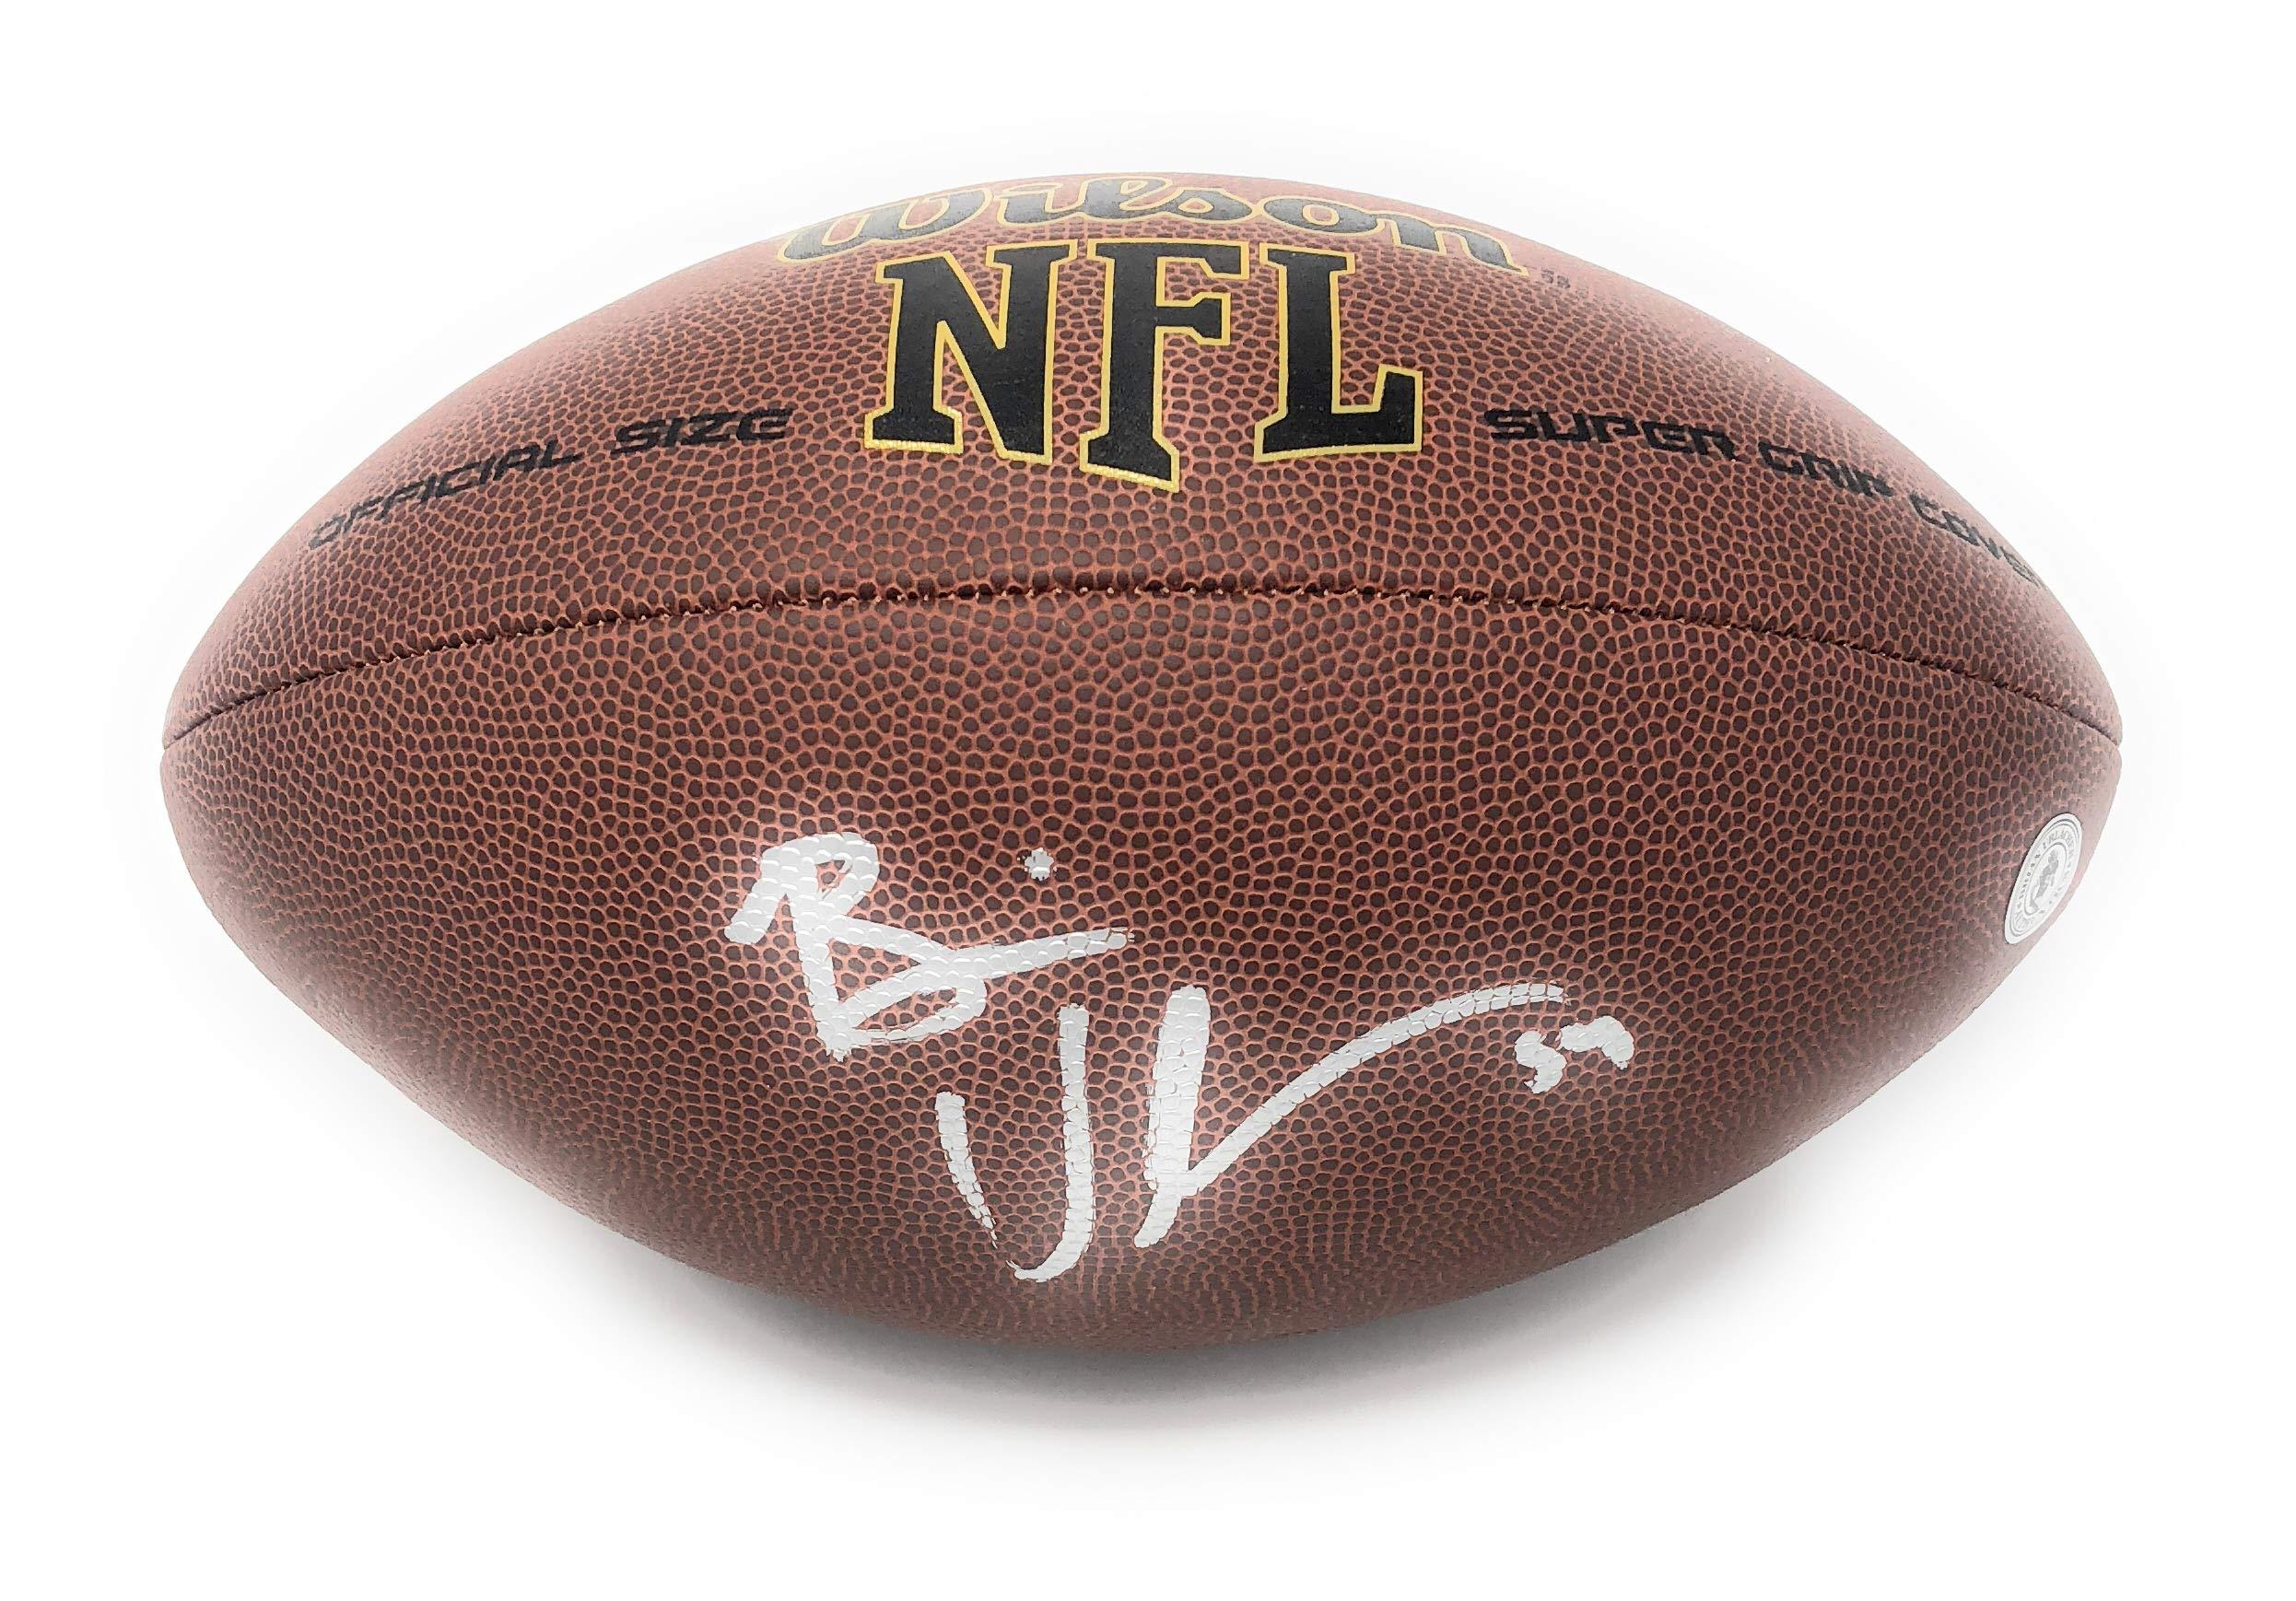 Brian Urlacher Chicago Bears Signed Autograph NFL Football Urlacher Player Hologram Certified